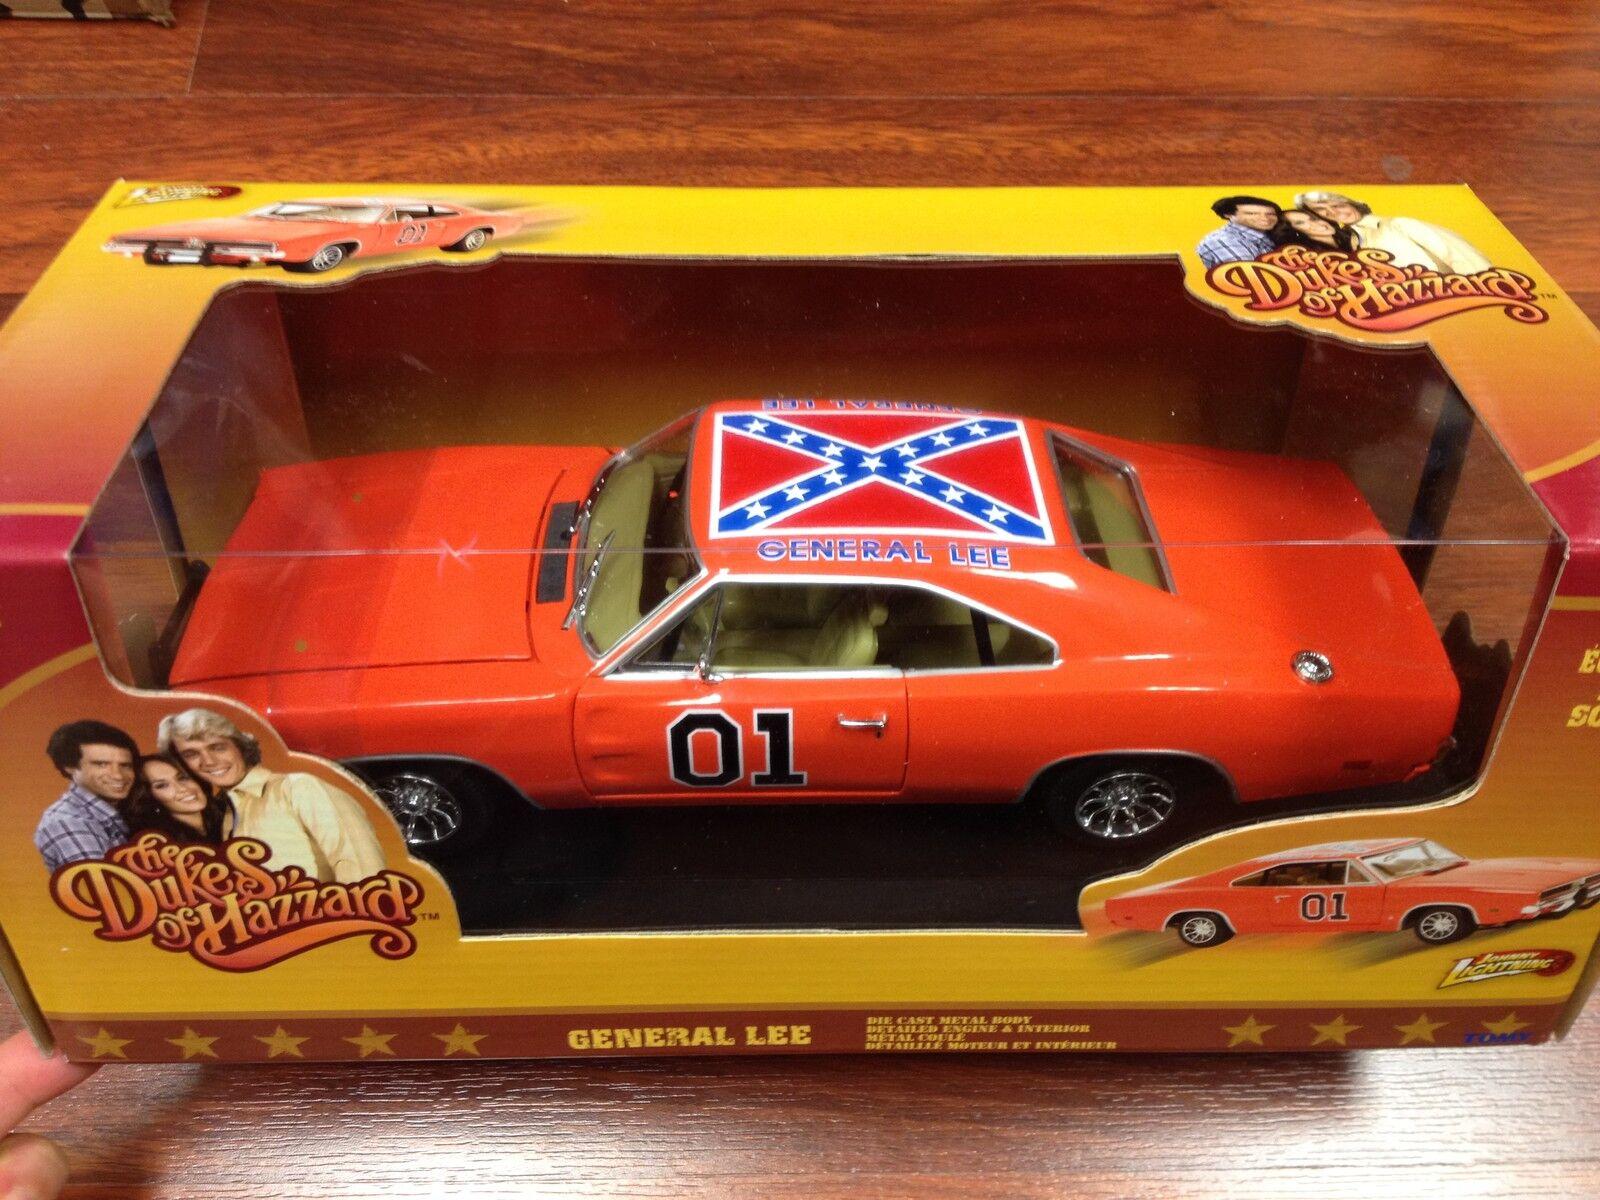 1 18 1969 Dodge Charger Flag General Lee Dukes of Hazzard Johnny Lightning